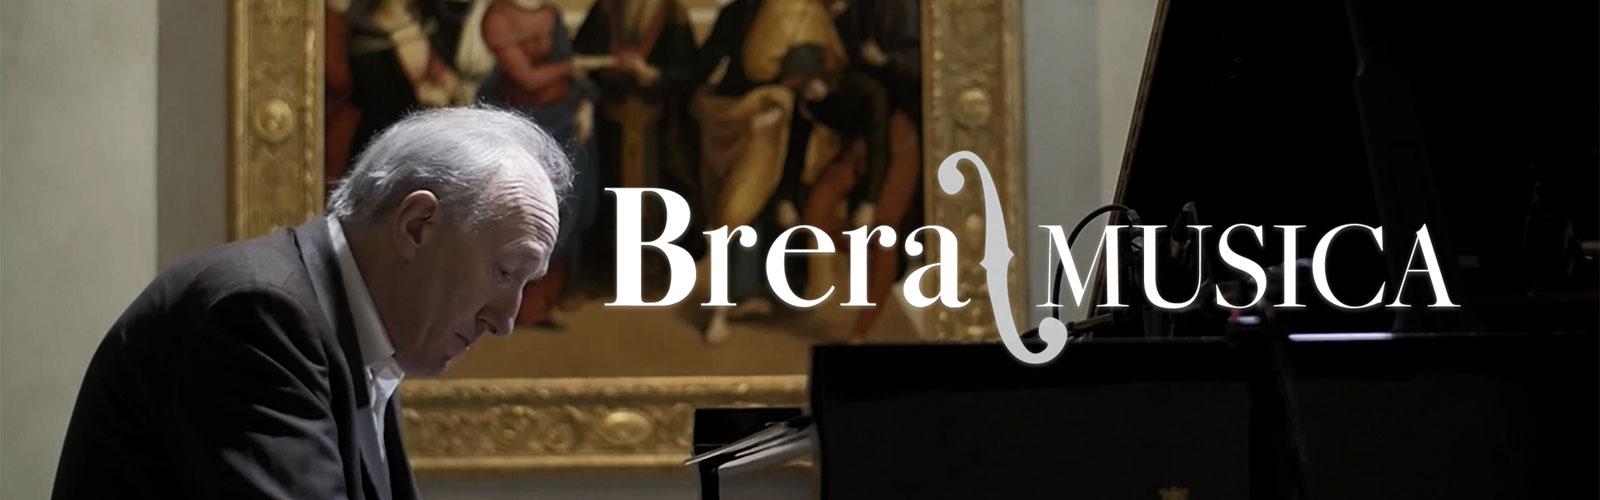 BRERA/MUSICA – <em>Années de pèlérinage. Deuxième Année. Italie <br>Sposalizio</em>, Franz Liszt